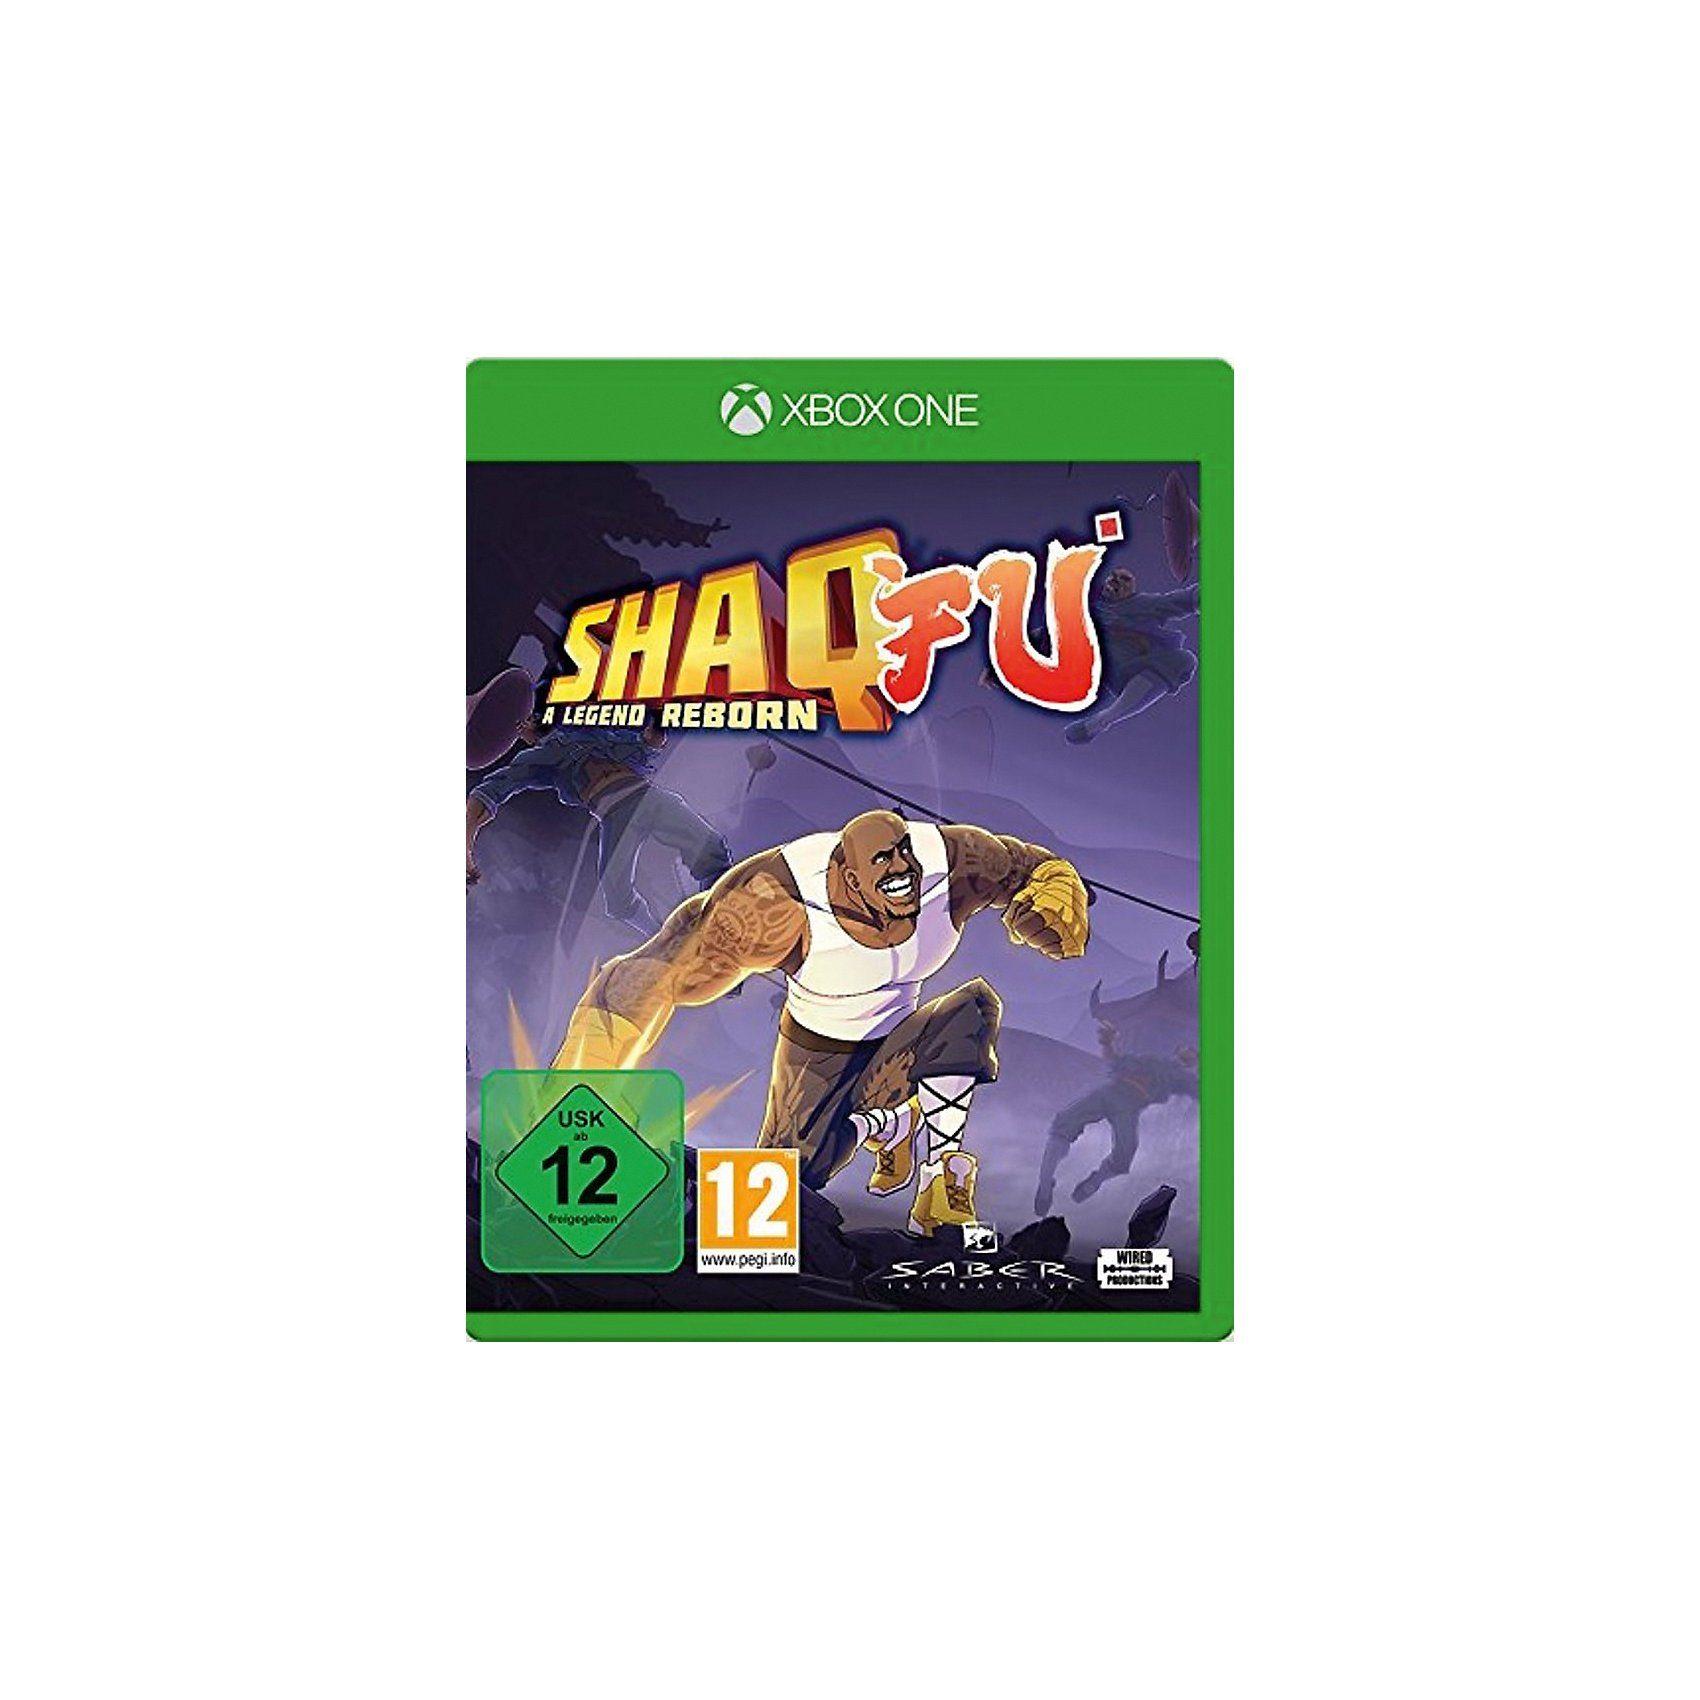 XBOXONE Shaq Fu: A Legend Reborn